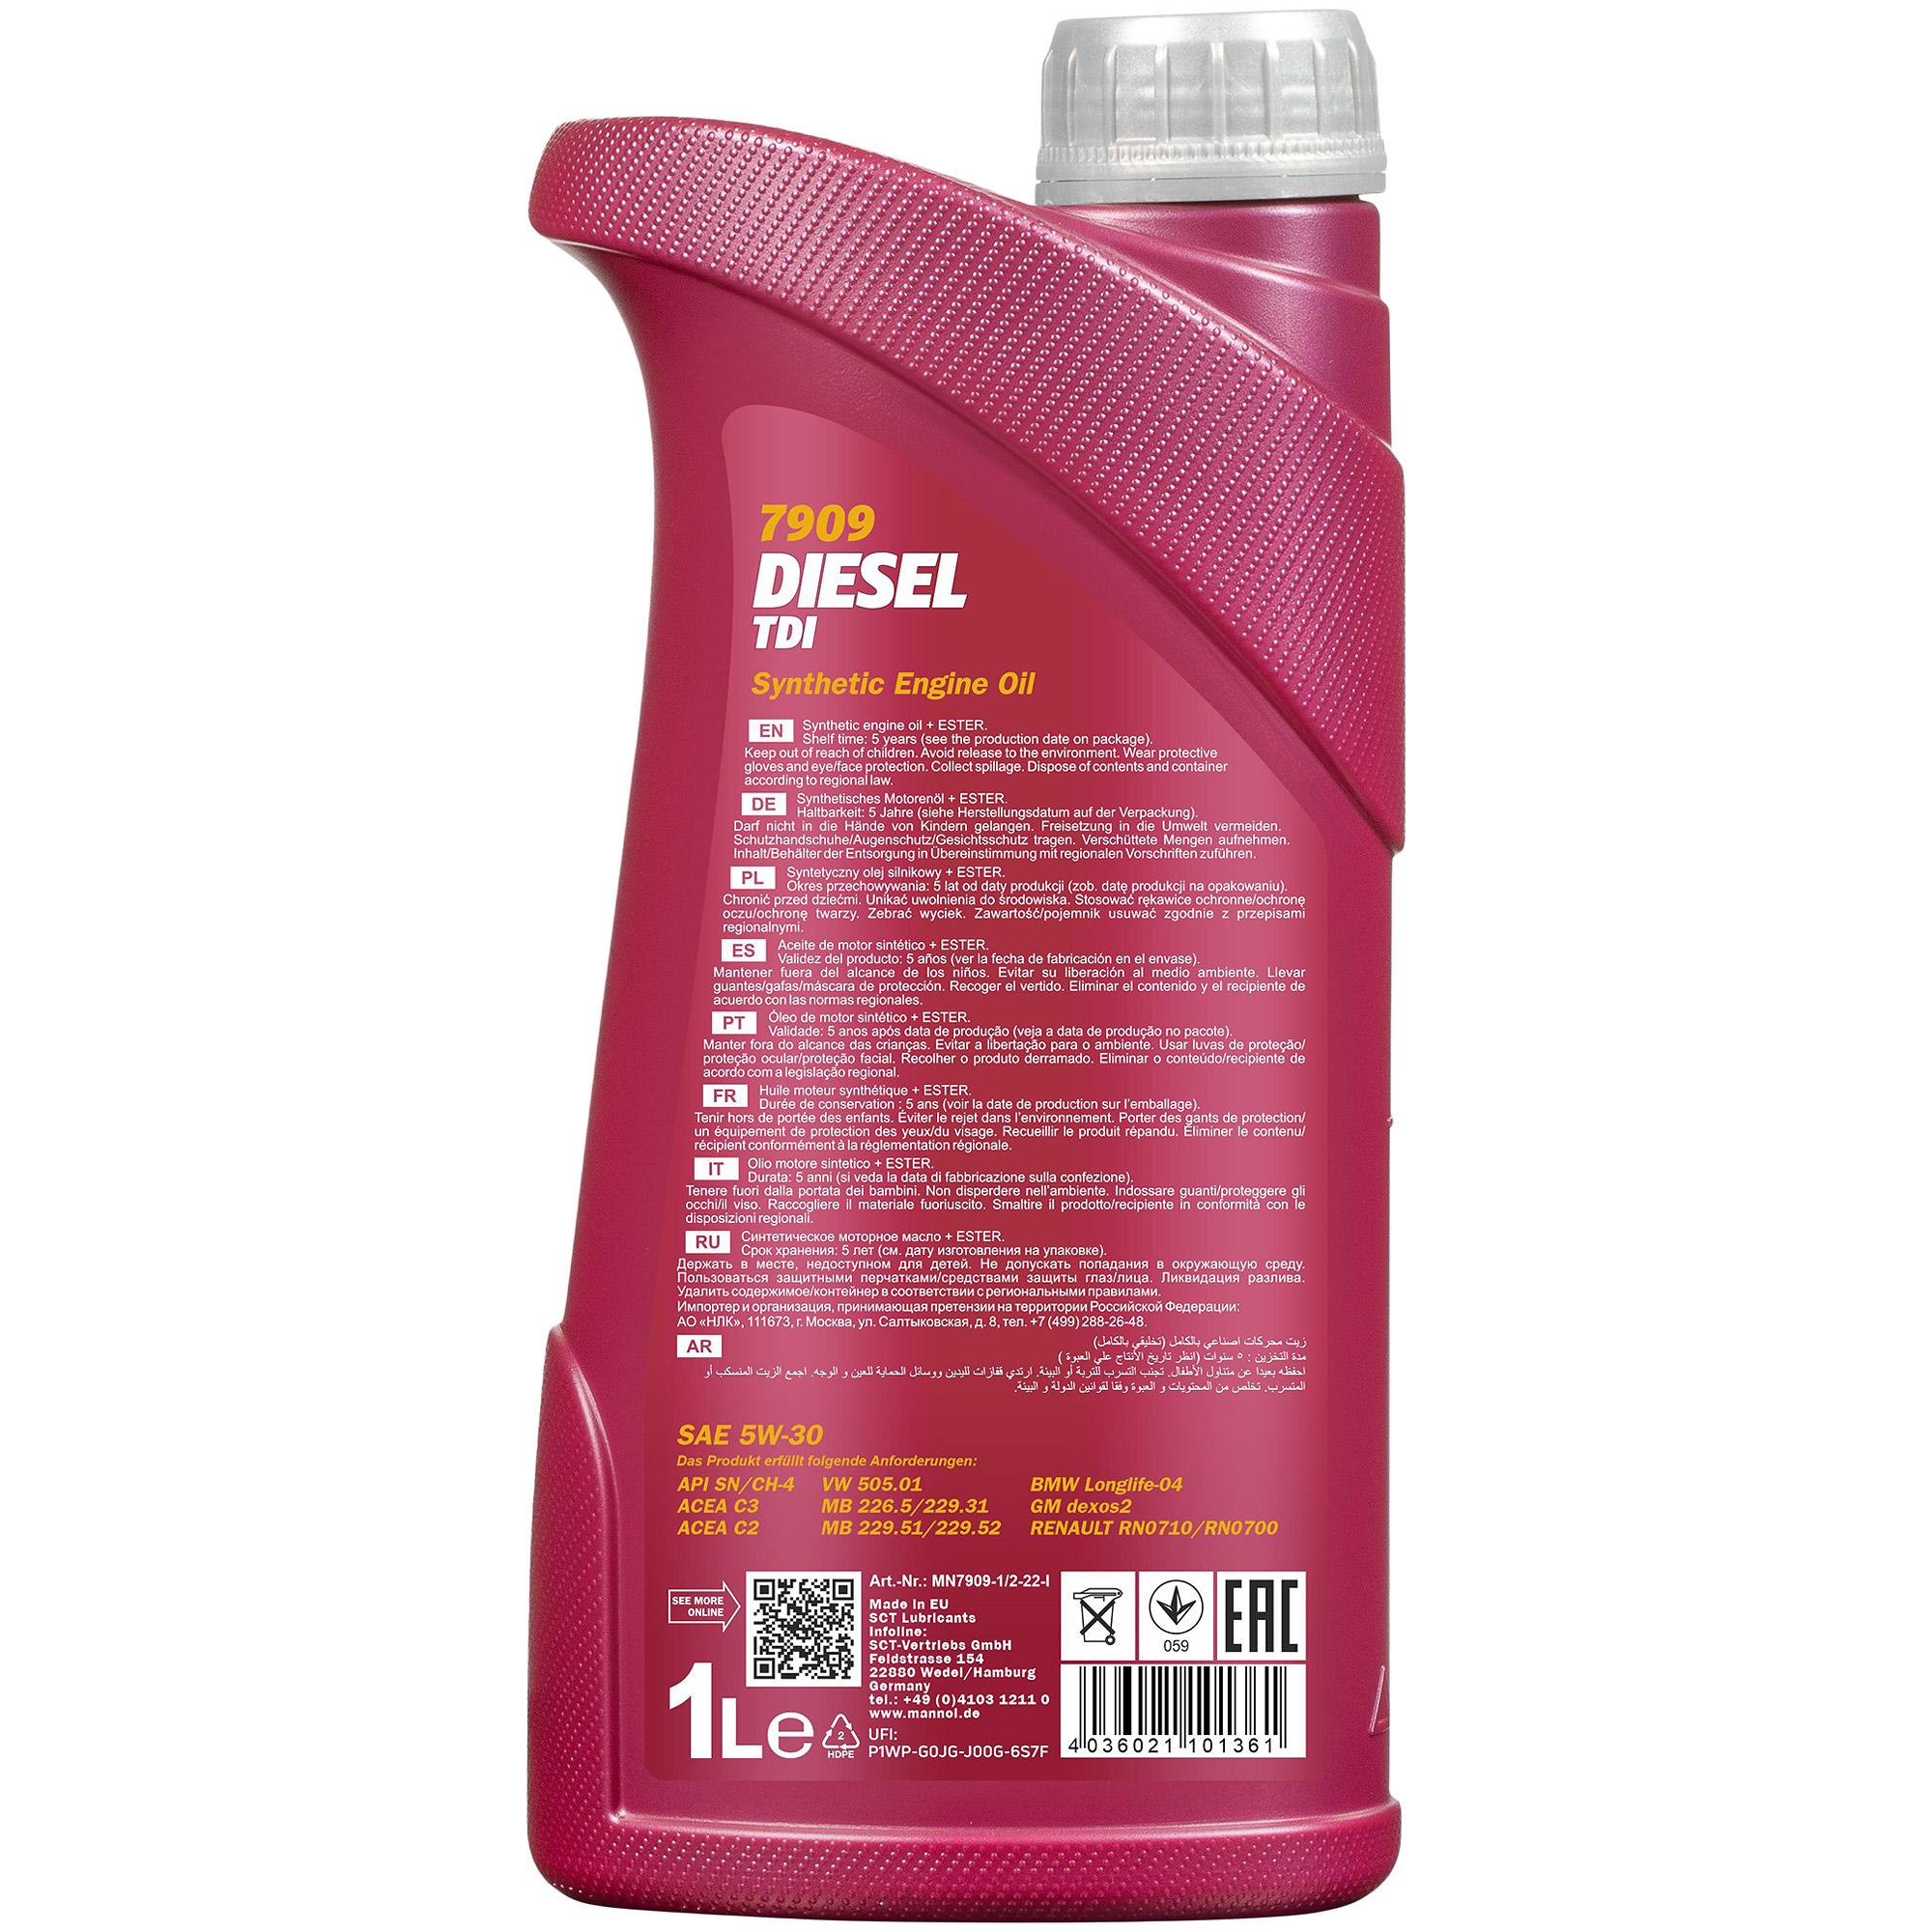 Aceite-del-motor-aceite-5w40-10w40-15w40-5w30-10w60-1l-4l-5l-7l-10l-20l miniatura 16